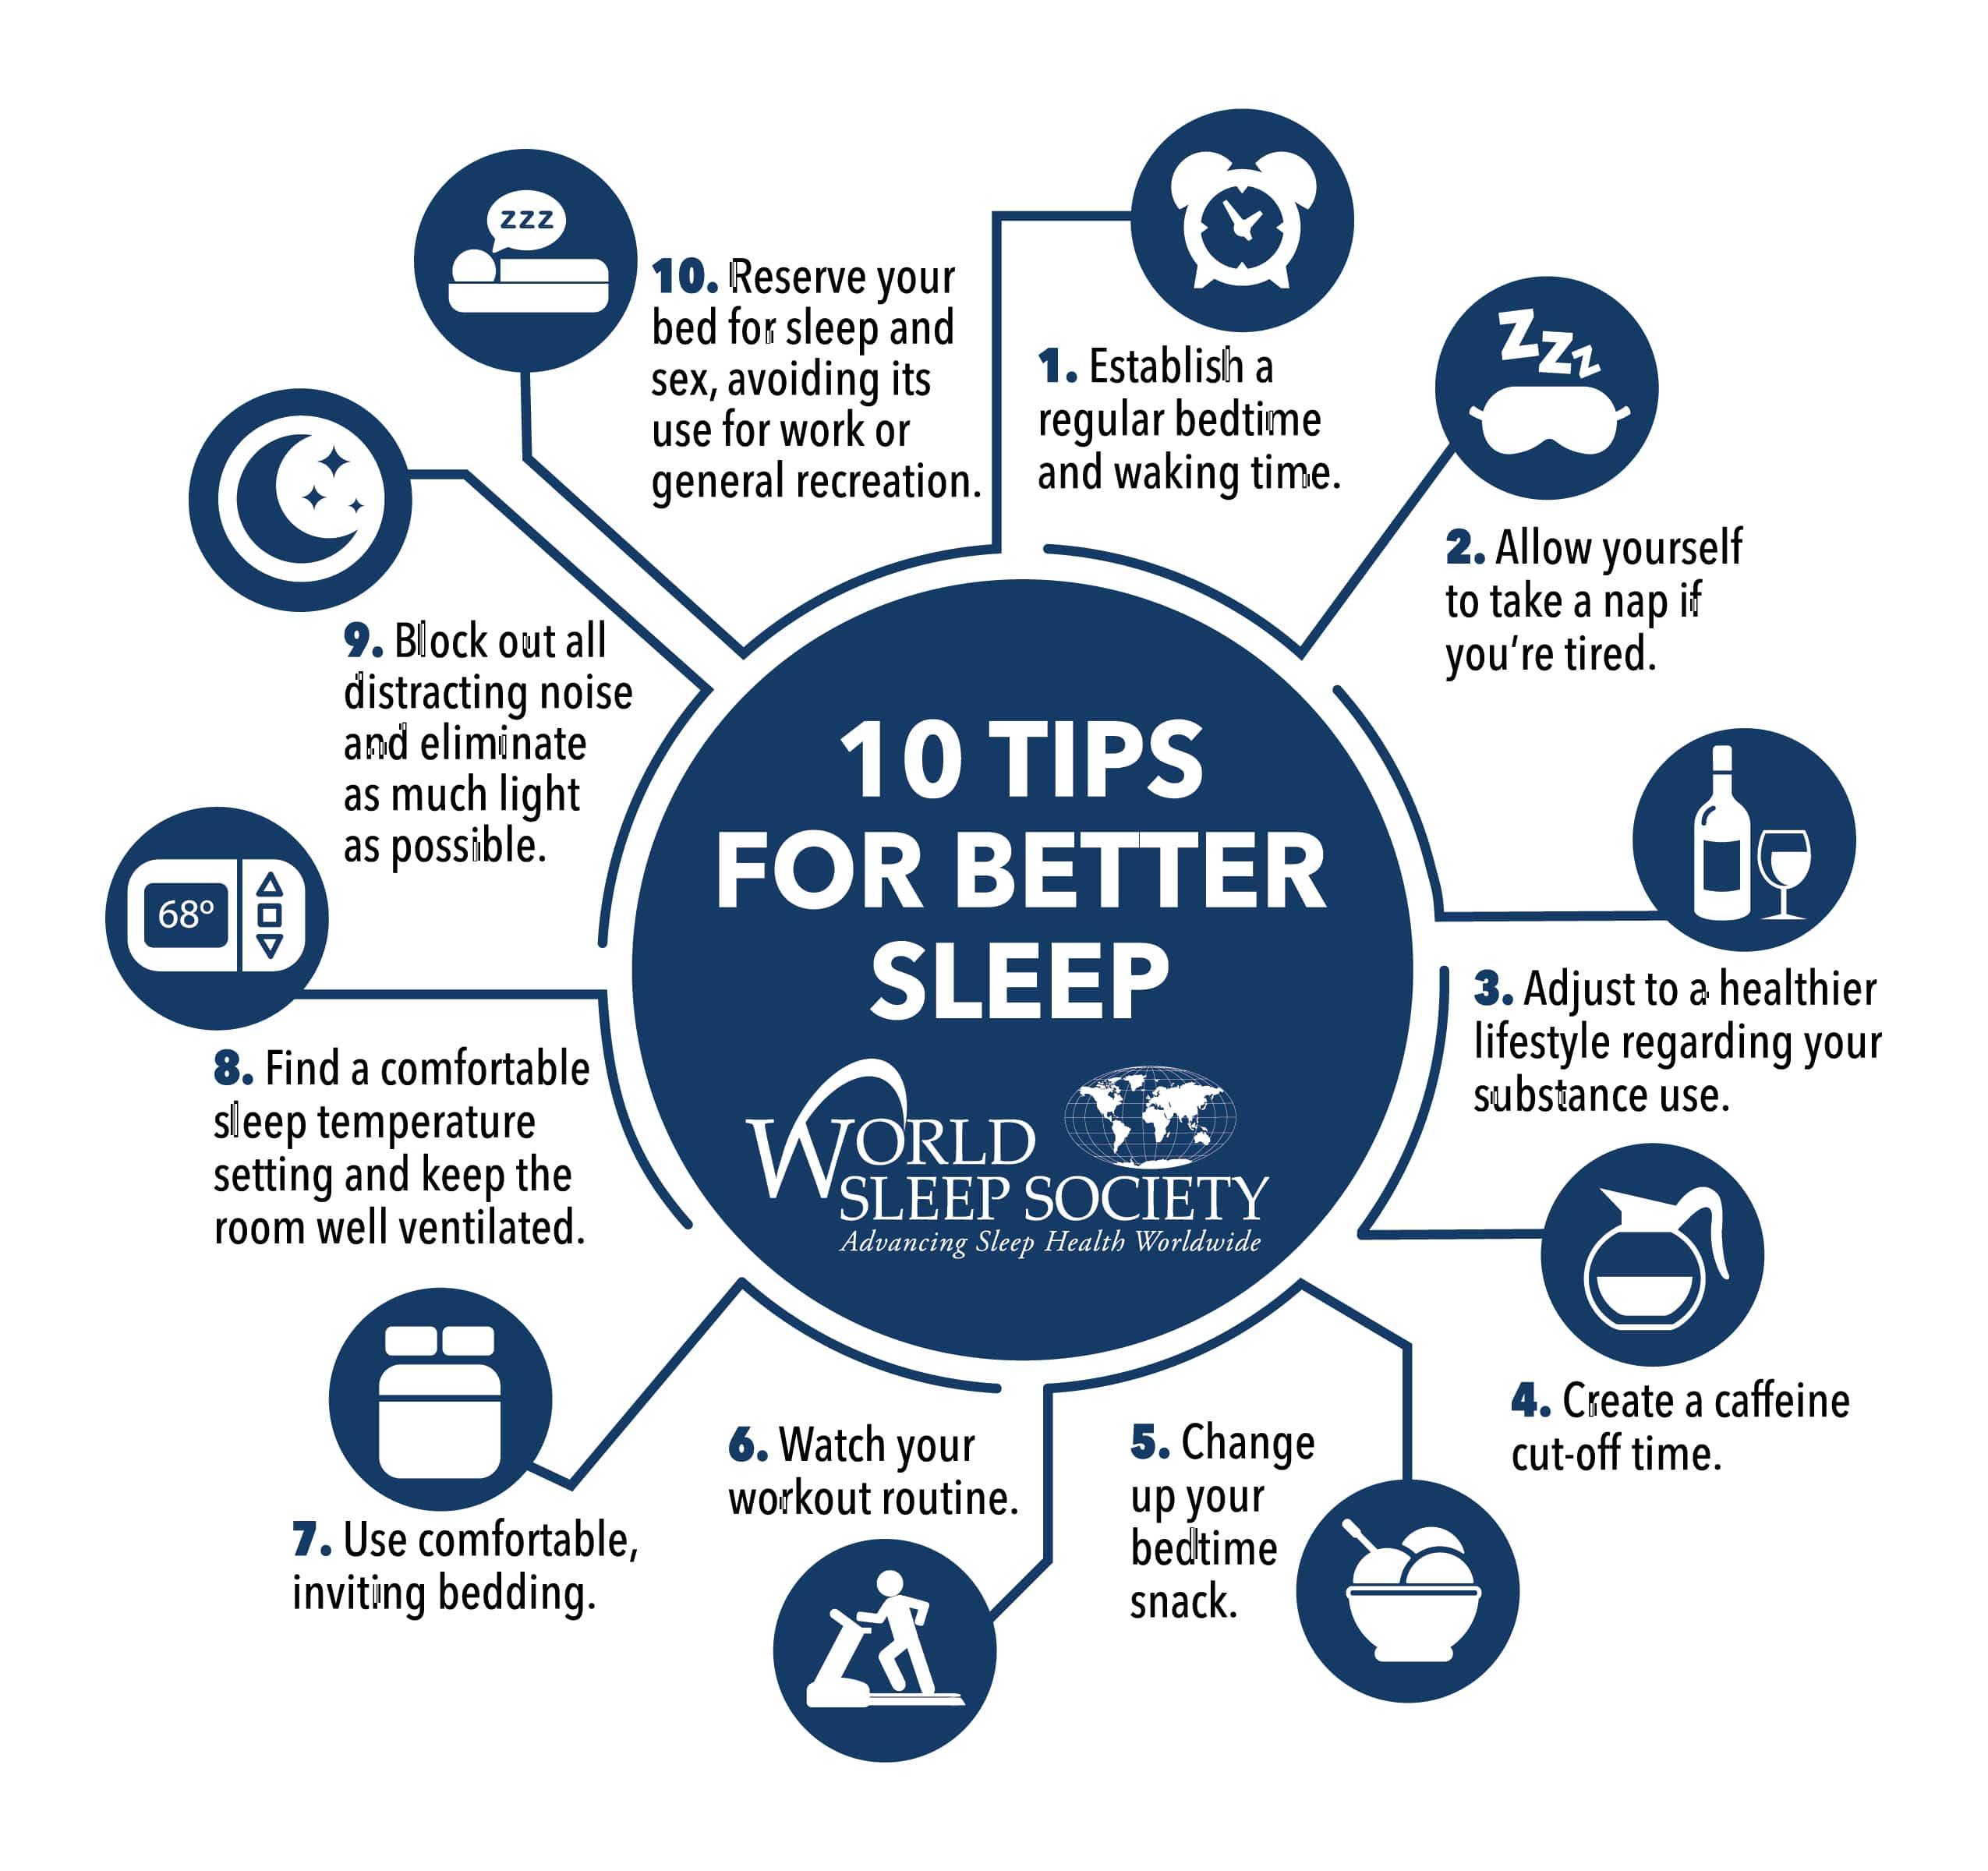 10 tips for better sleep graphic